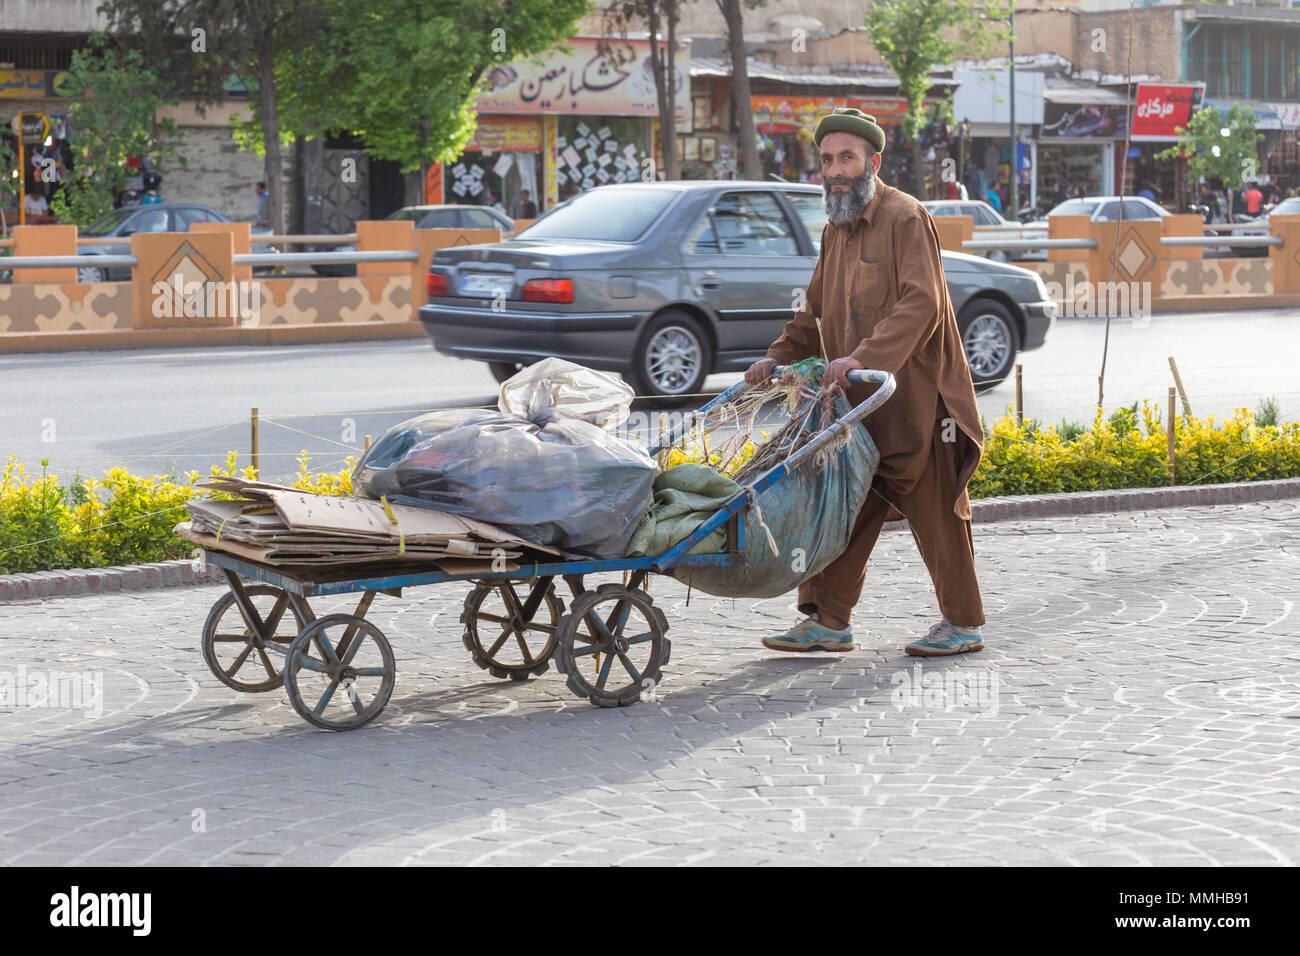 SHIRAZ, IRAN - APRIL 25, 2015: an unidentified man pushes a cart in the streets of Shiraz, Iran - Stock Image